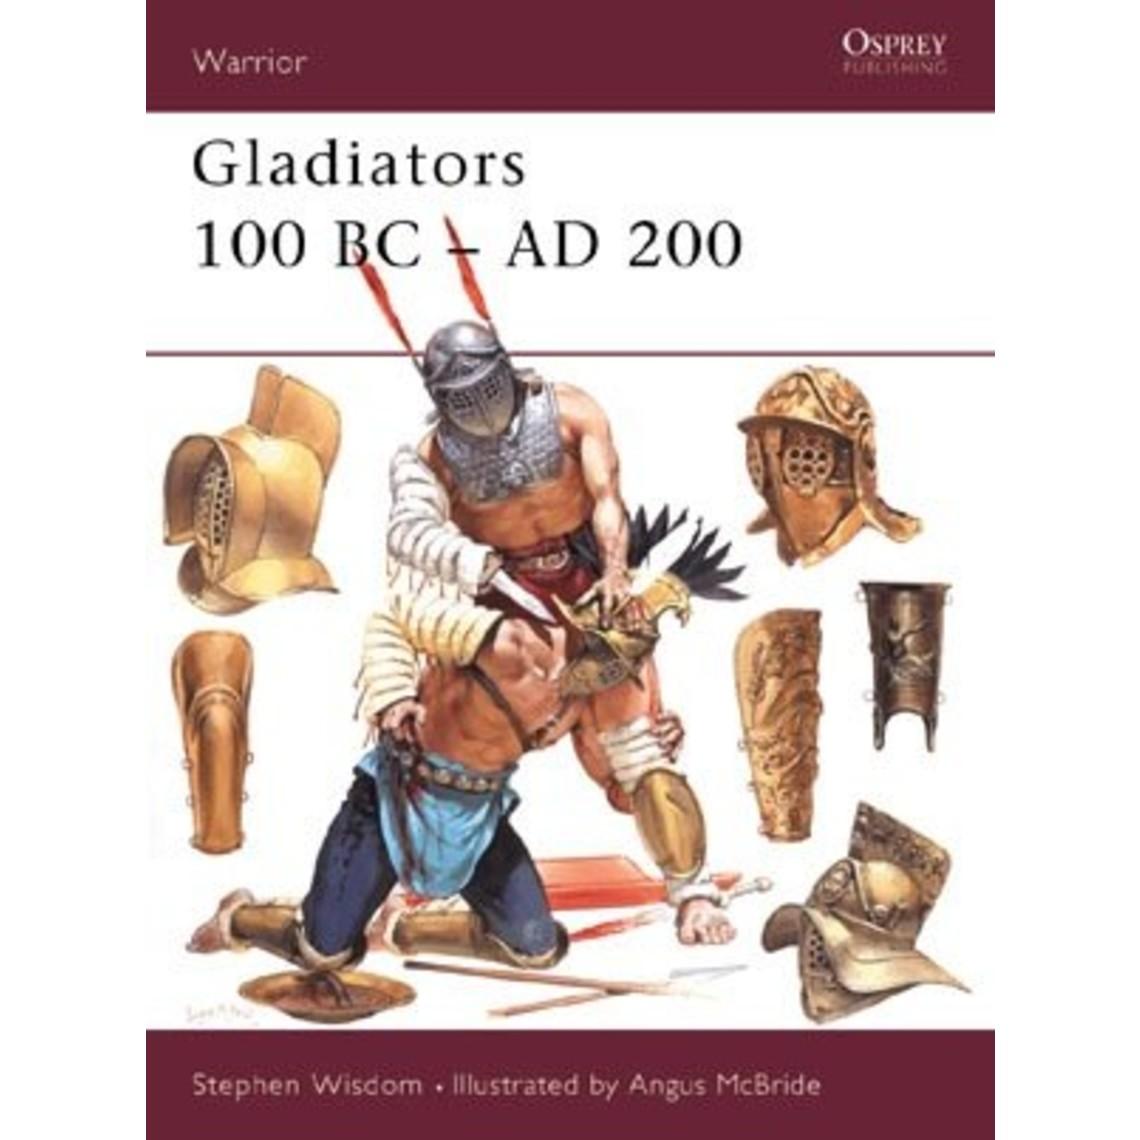 Osprey: Gladiators 100 BC-AD 200